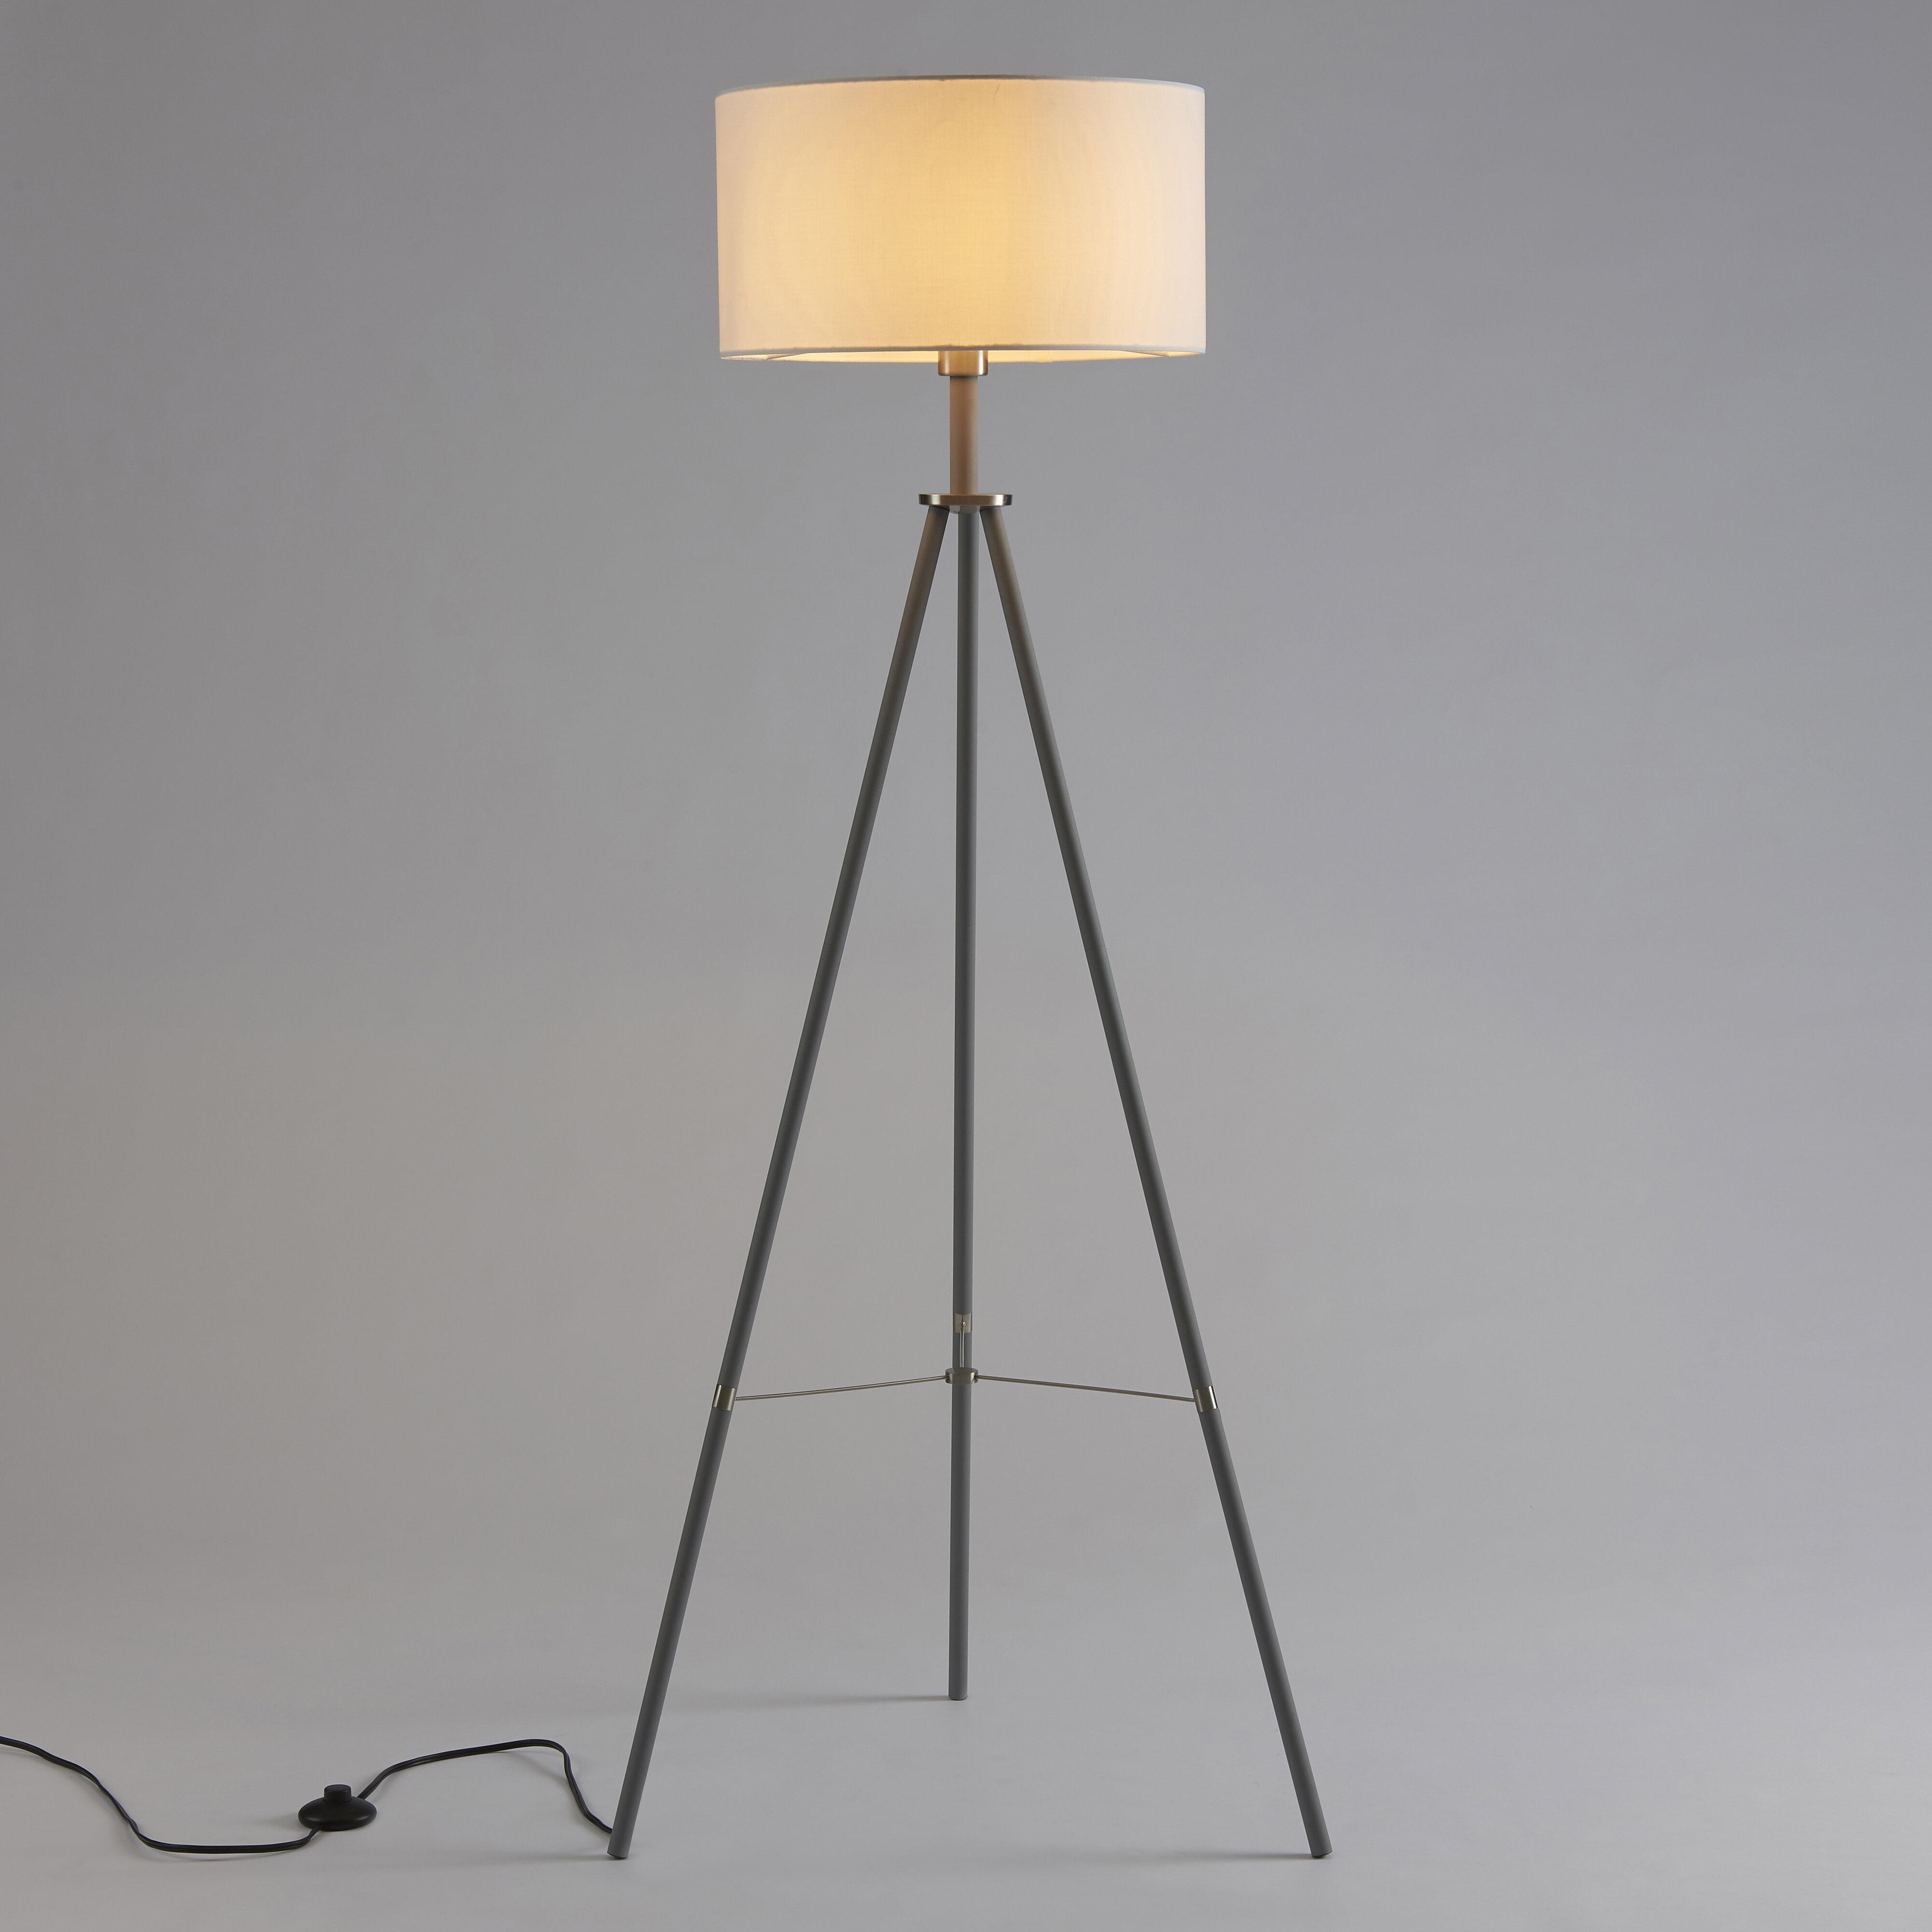 Modern Contemporary Tripod Floor Lamps You Ll Love In 2021 Wayfair